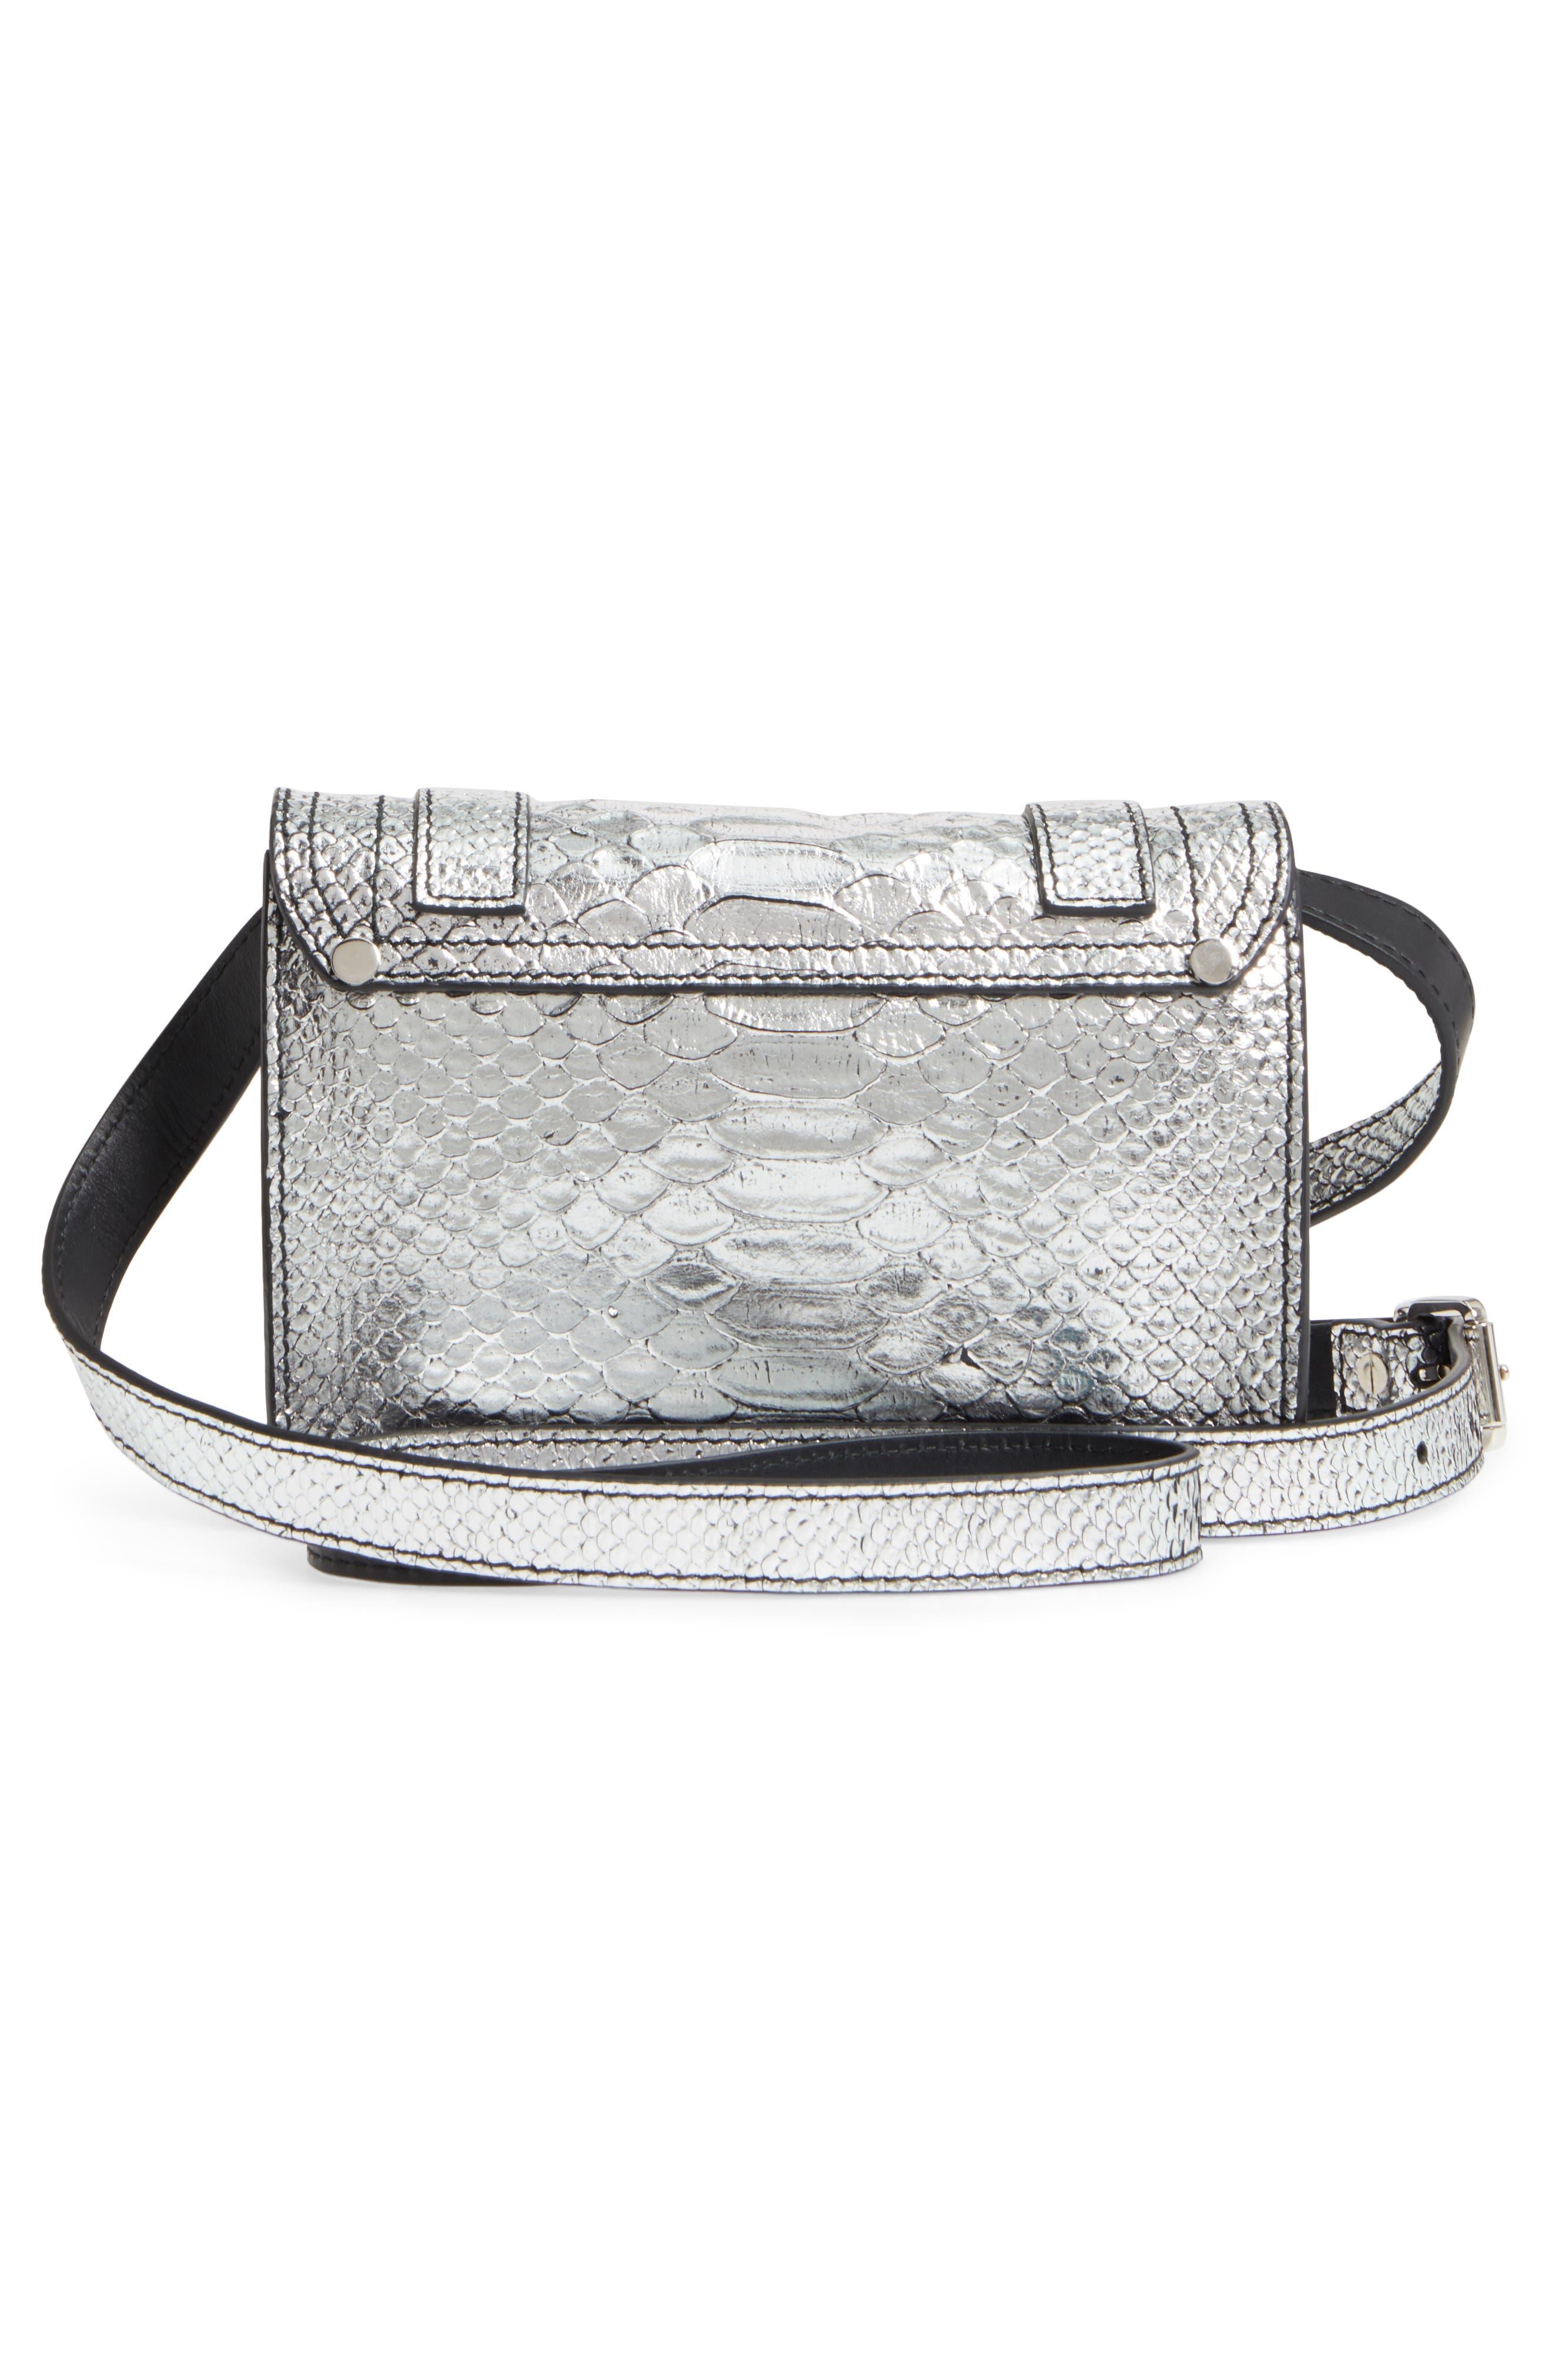 Alternate Image 2  - Proenza Schouler Mini PS1 Snakeskin Embossed Metallic Leather Crossbody Bag